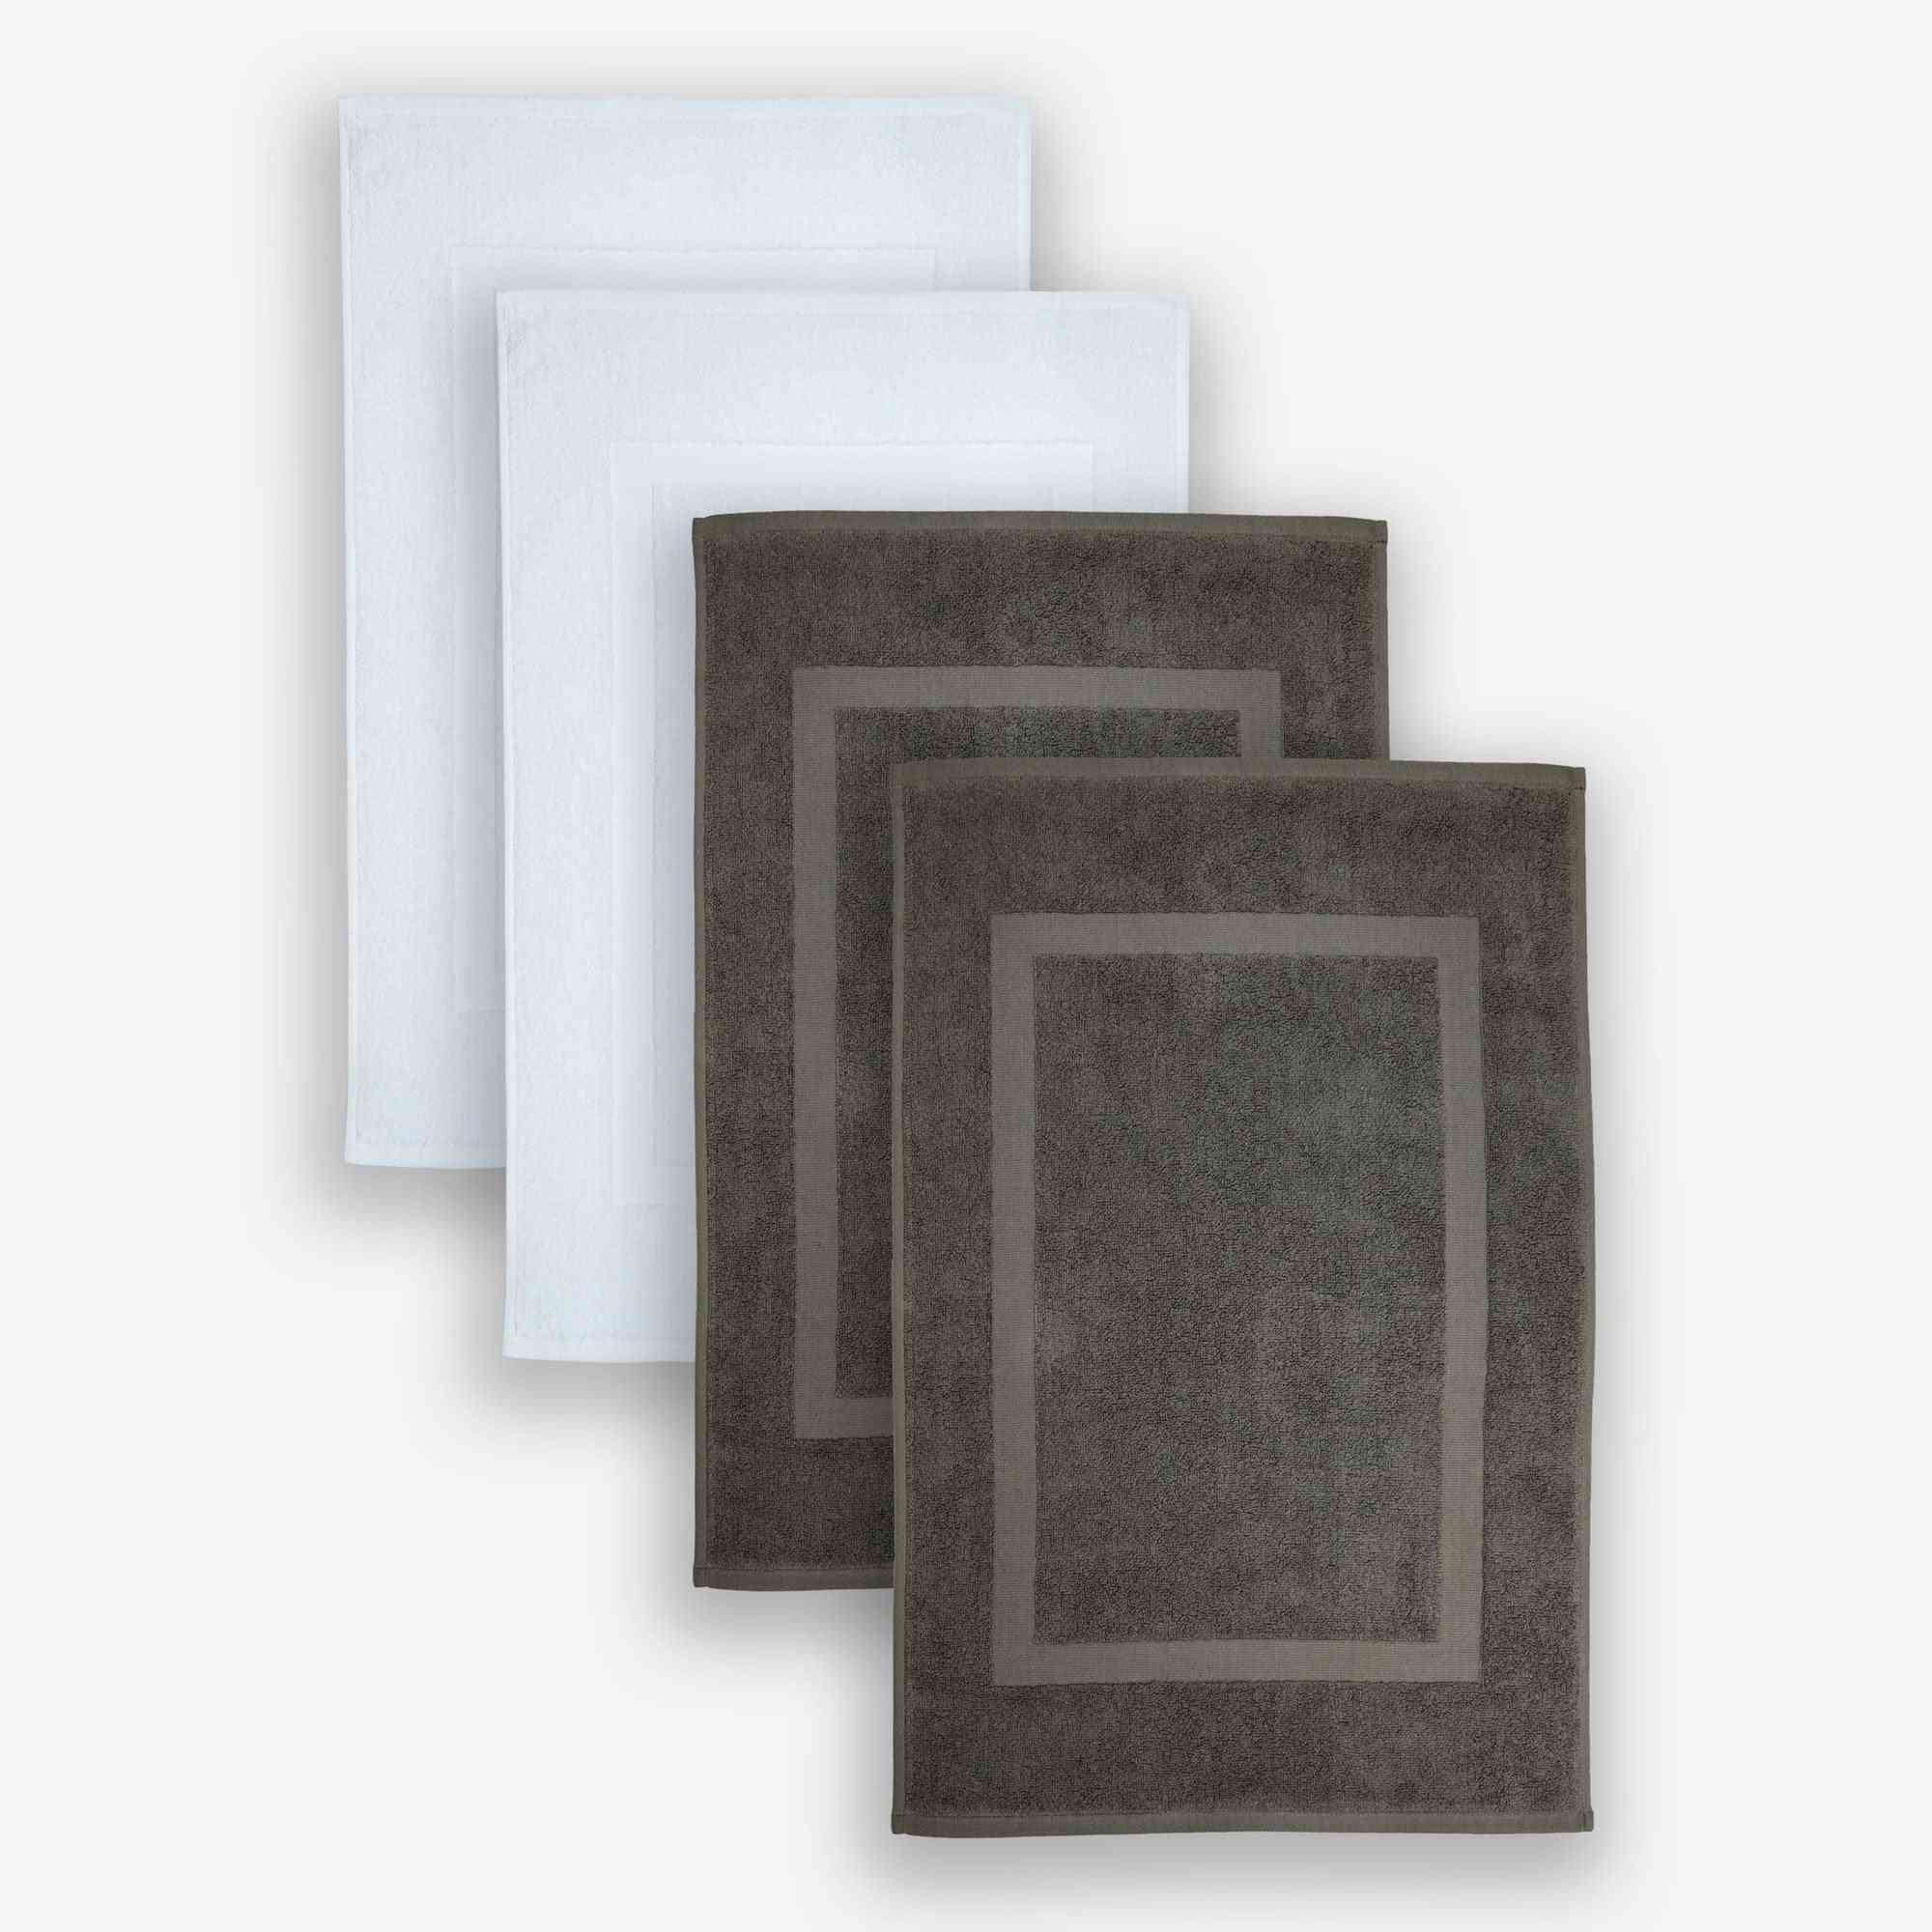 100% Cotton, Set Of 4 Bath Floormat, Terry Floormat, 20